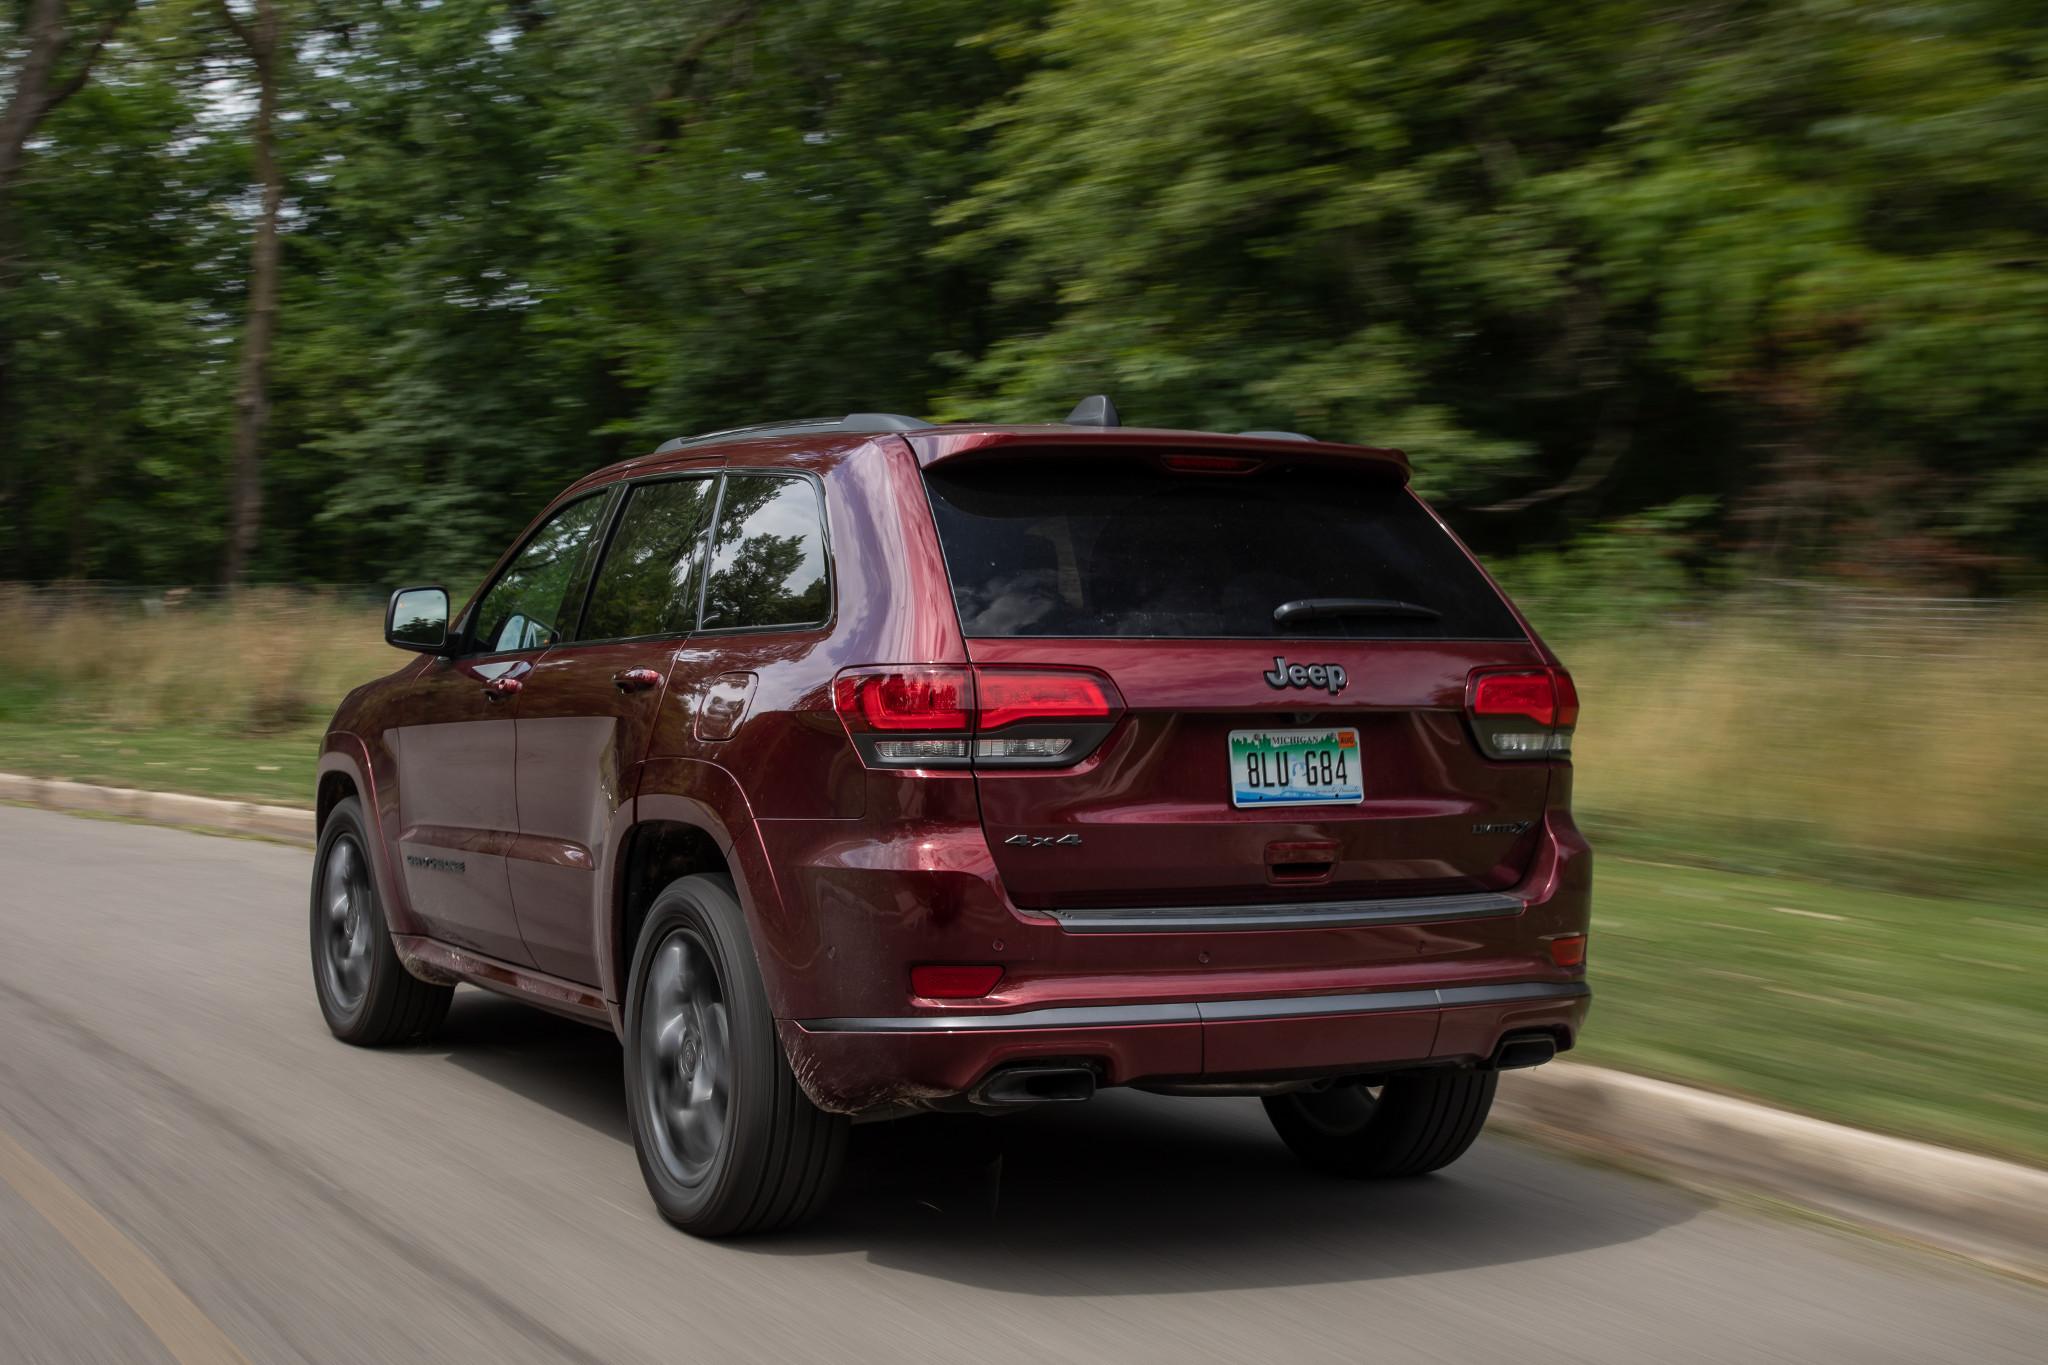 jeep-grand-cherokee-2019-07-exterior--red.jpg